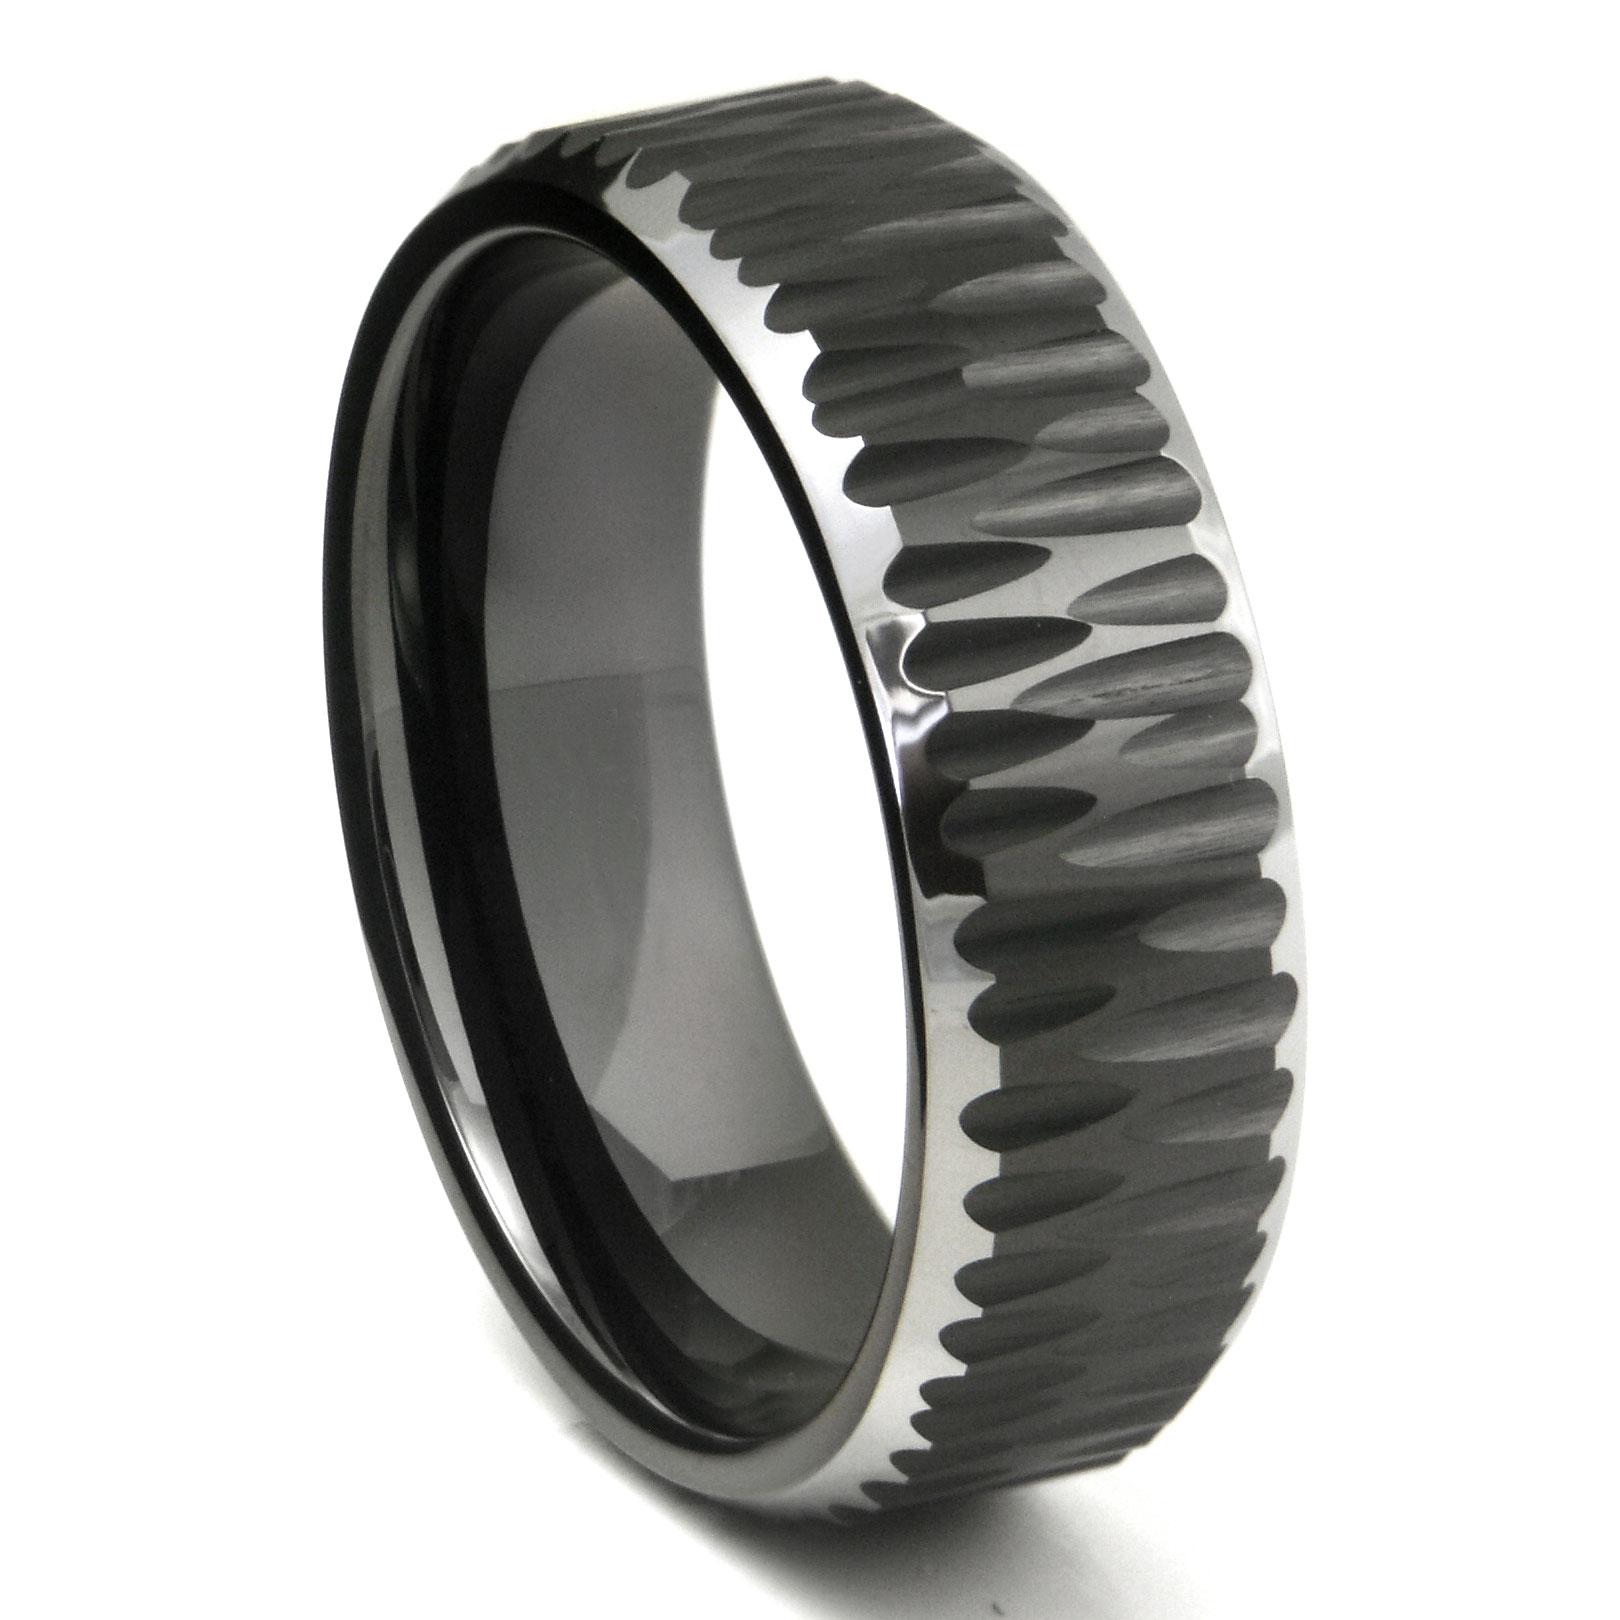 Black Tungsten Carbide Hammer Finish Beveled Wedding Band Ring P tungsten carbide wedding band Home Men s Tungsten Carbide Rings Loading zoom